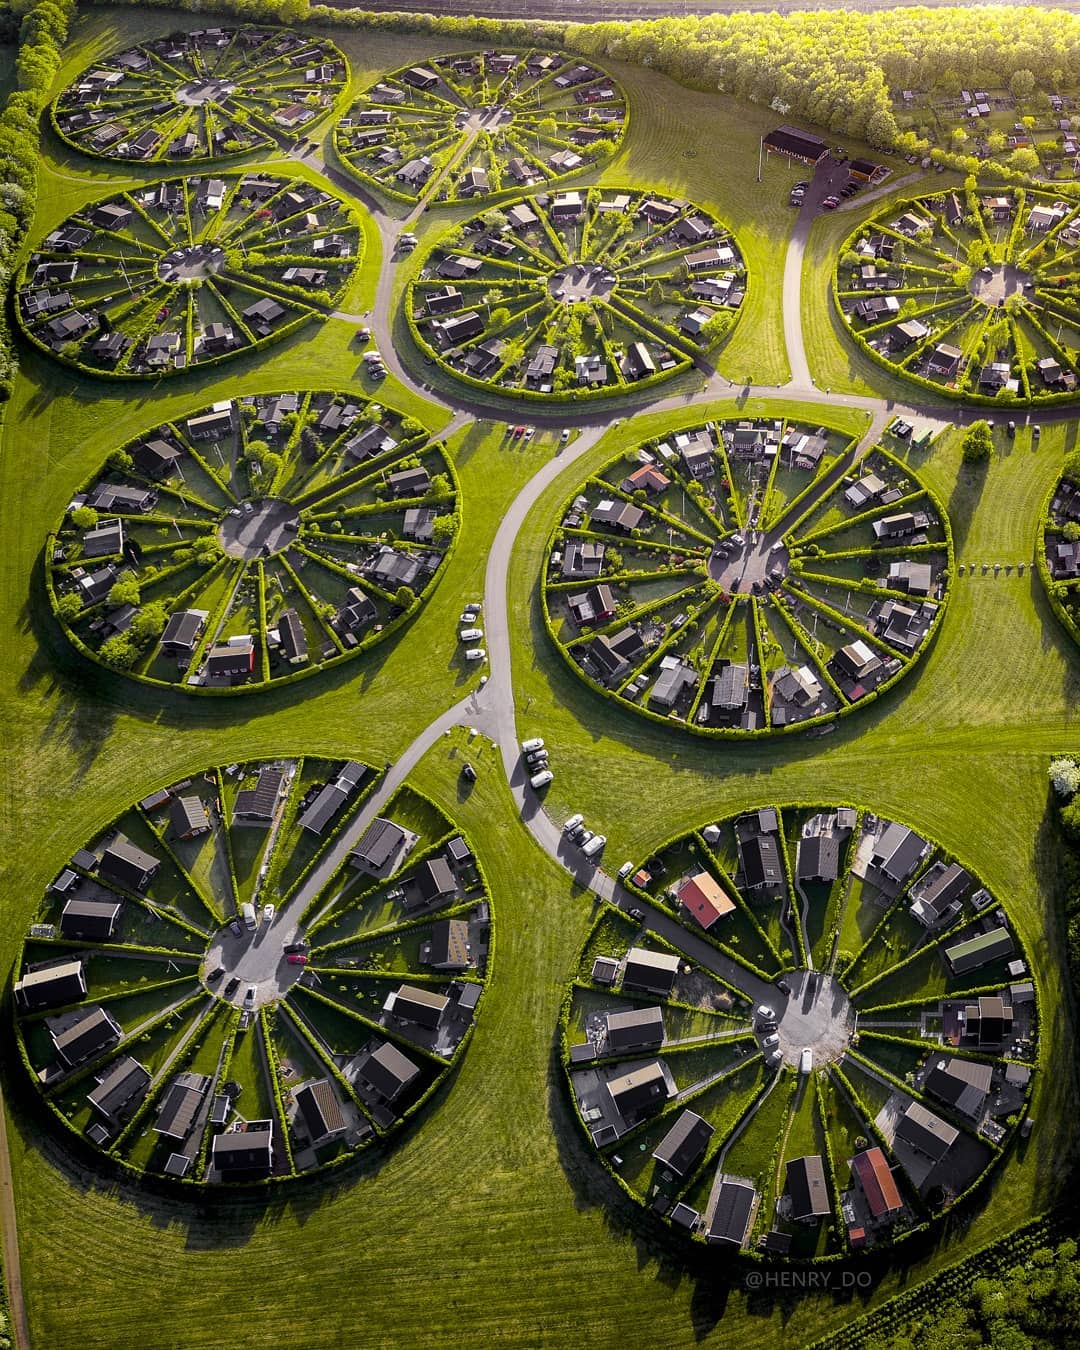 Gorgeous Aerial Photos and Footage of 12 Circular Community Gardens Near Copenhagen, Denmark